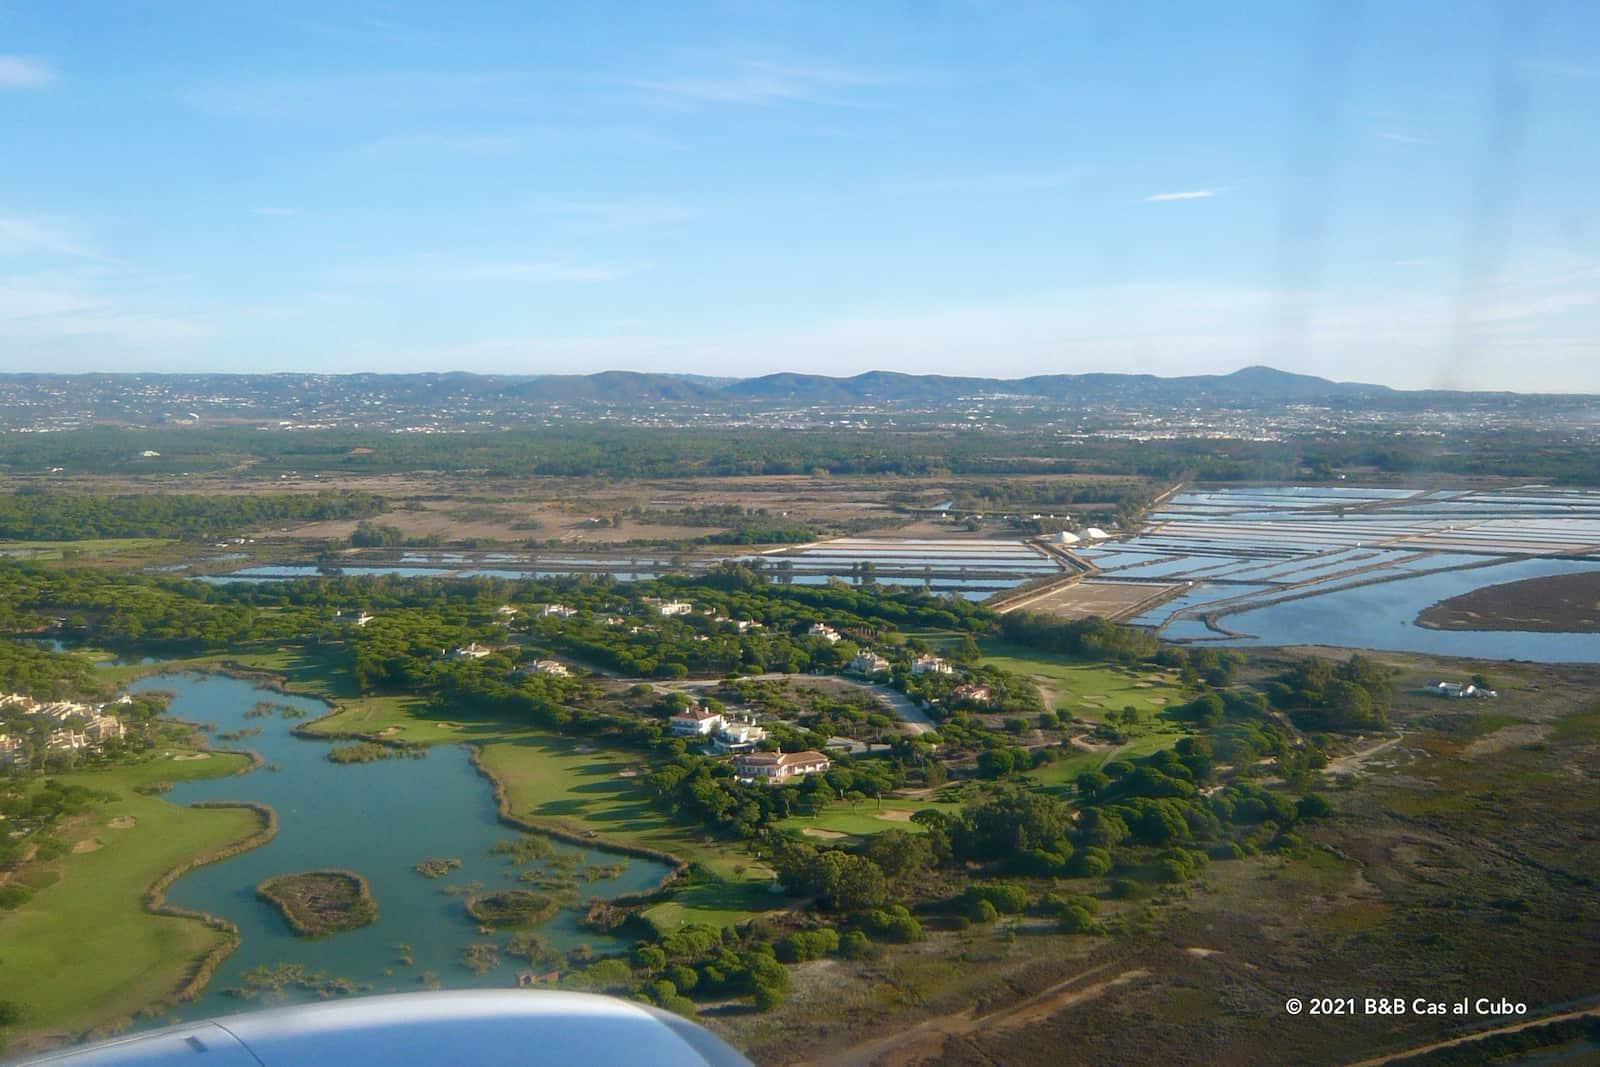 Ria Formosa wetlands - birdwatching paradise - Ludo Faro